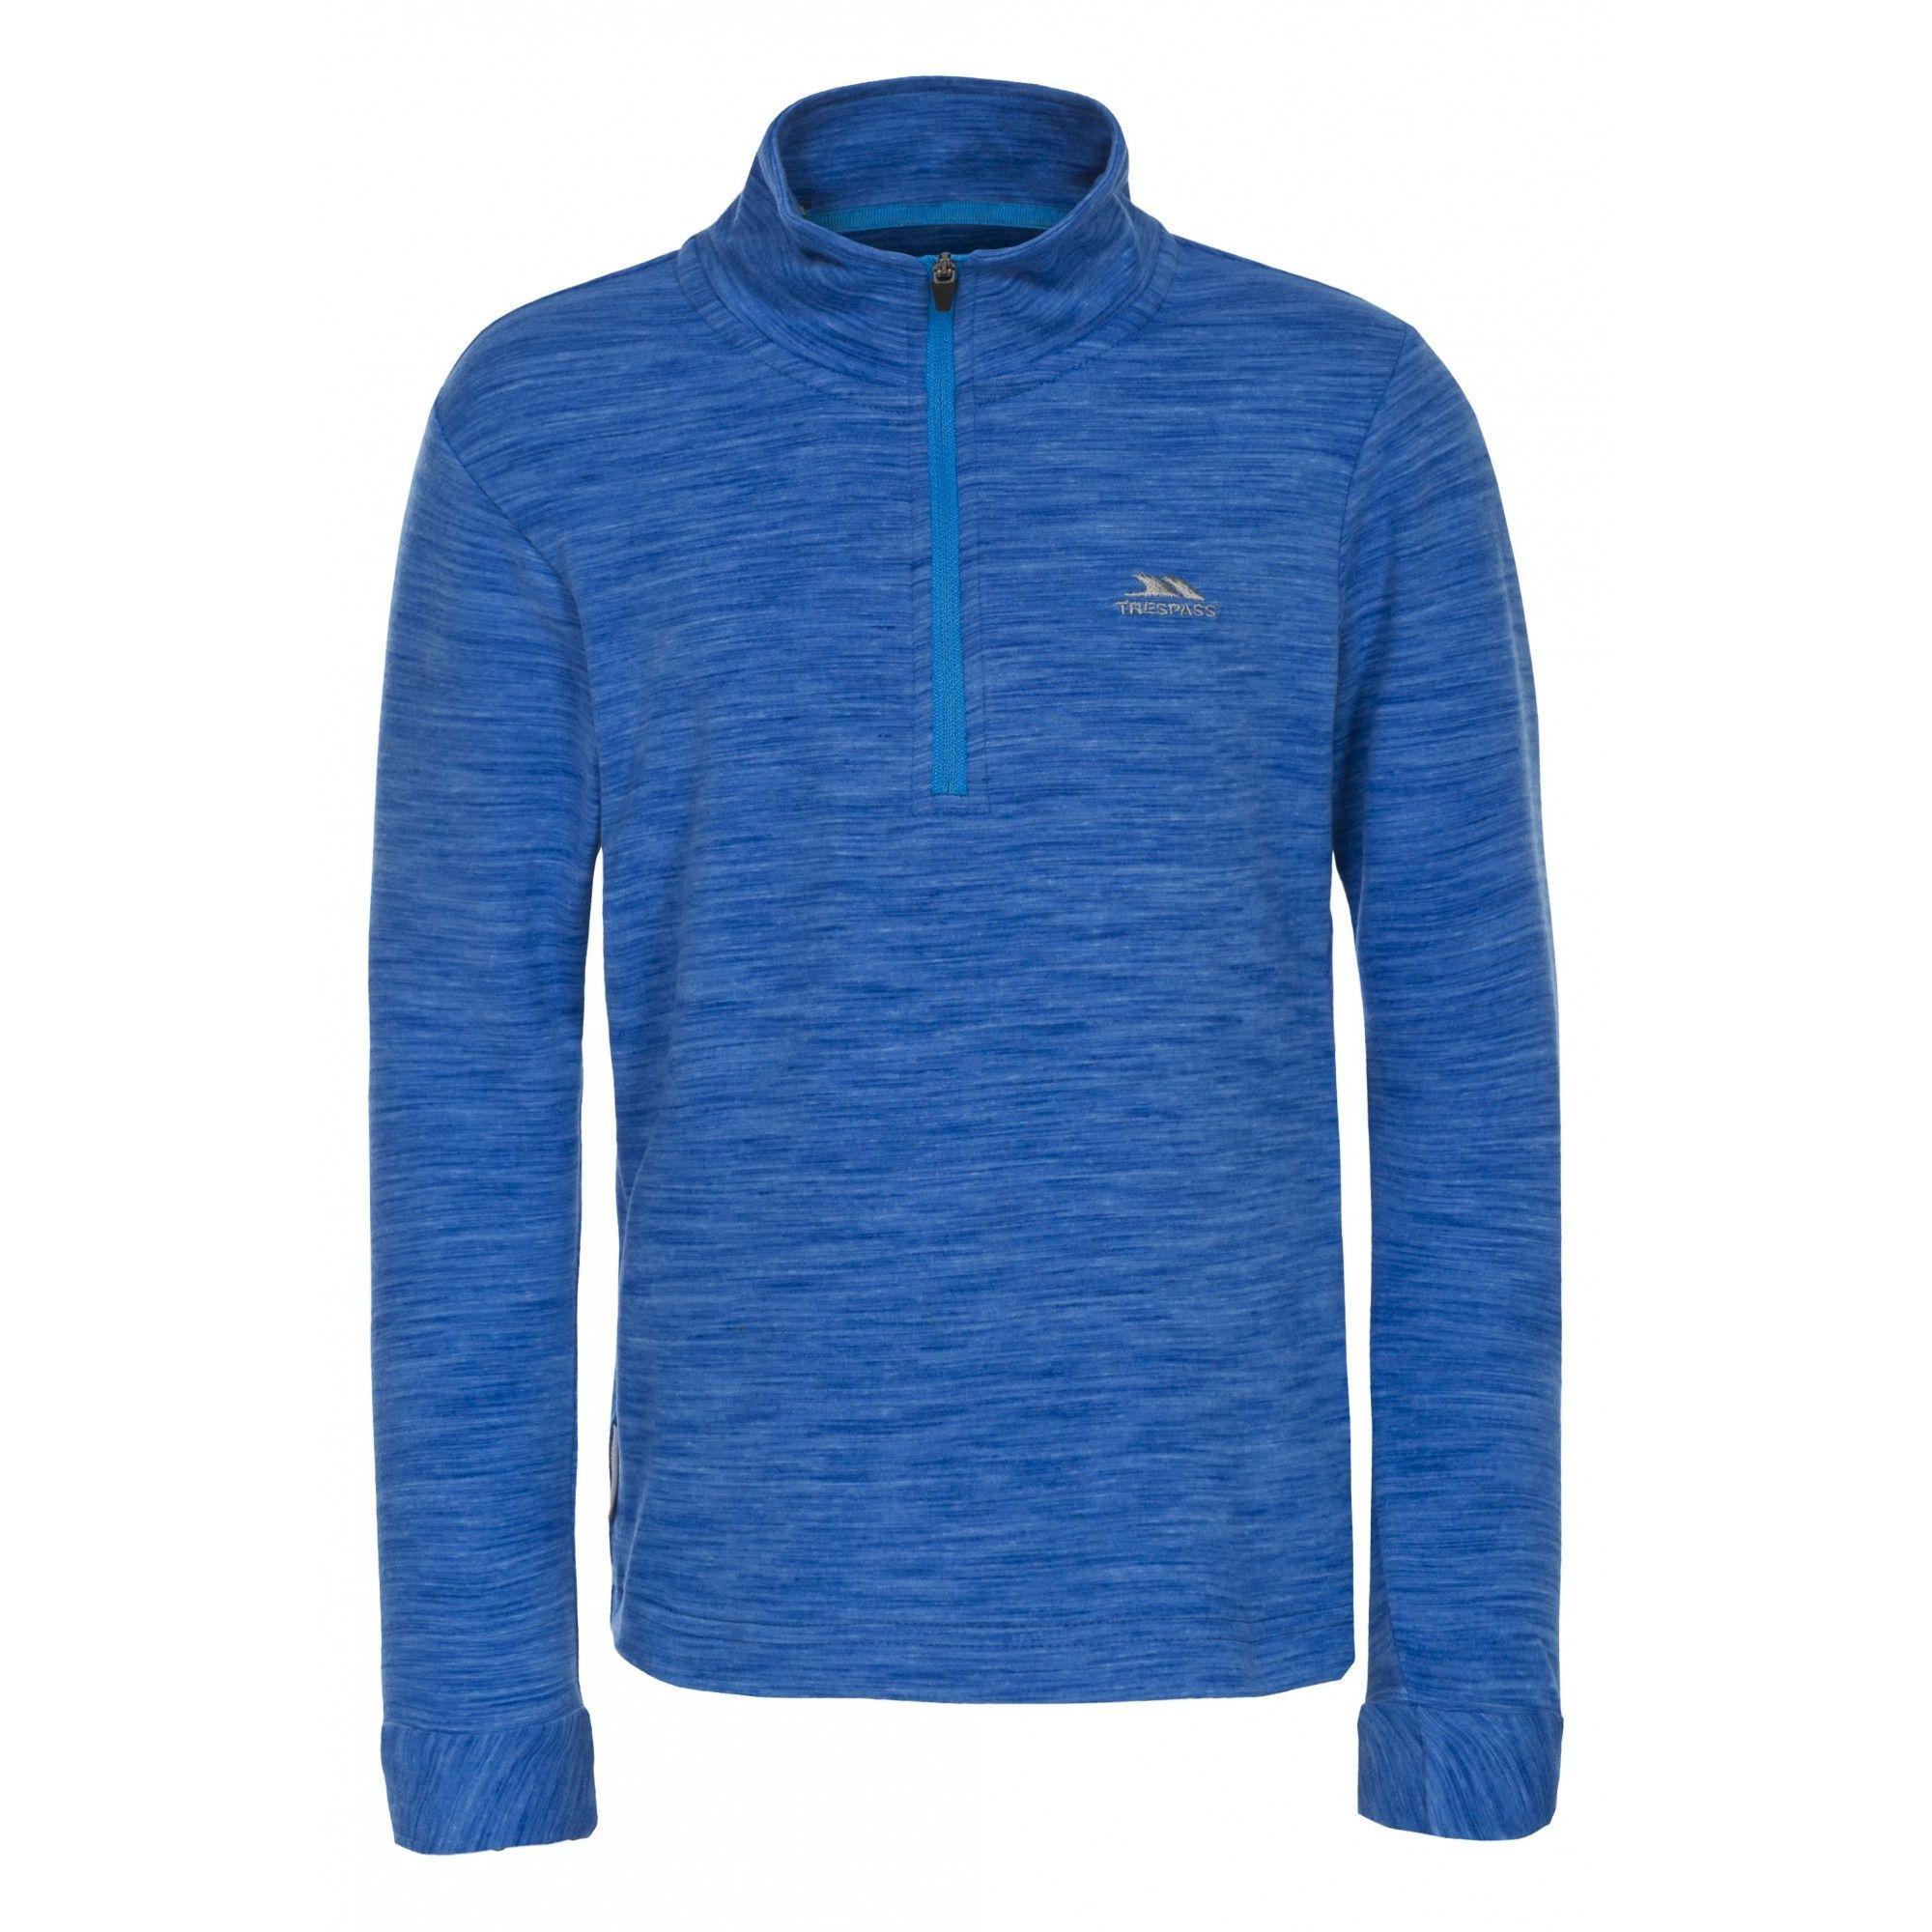 Trespass Childrens/Kids Abra 1/2 Zip Sweater Top